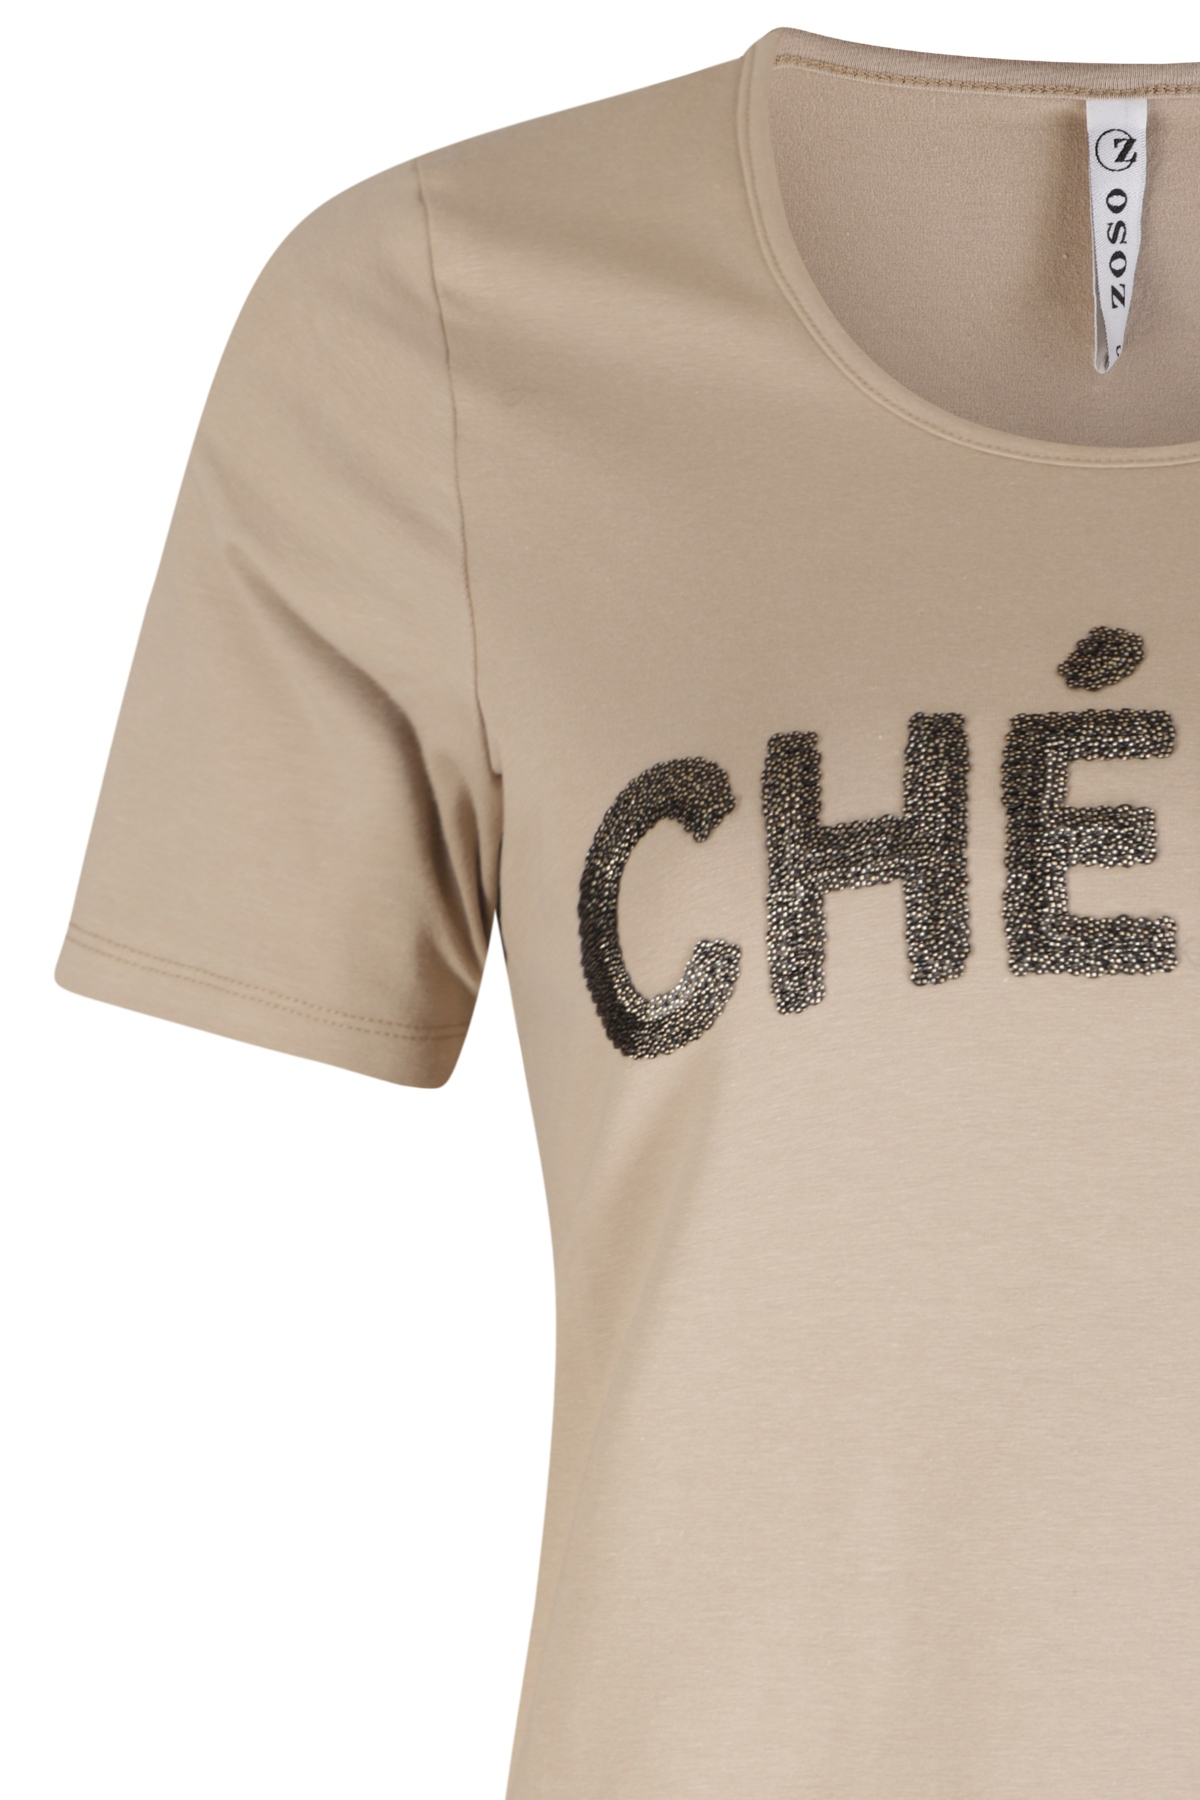 Zoso Shirt - Top Beige Cherie